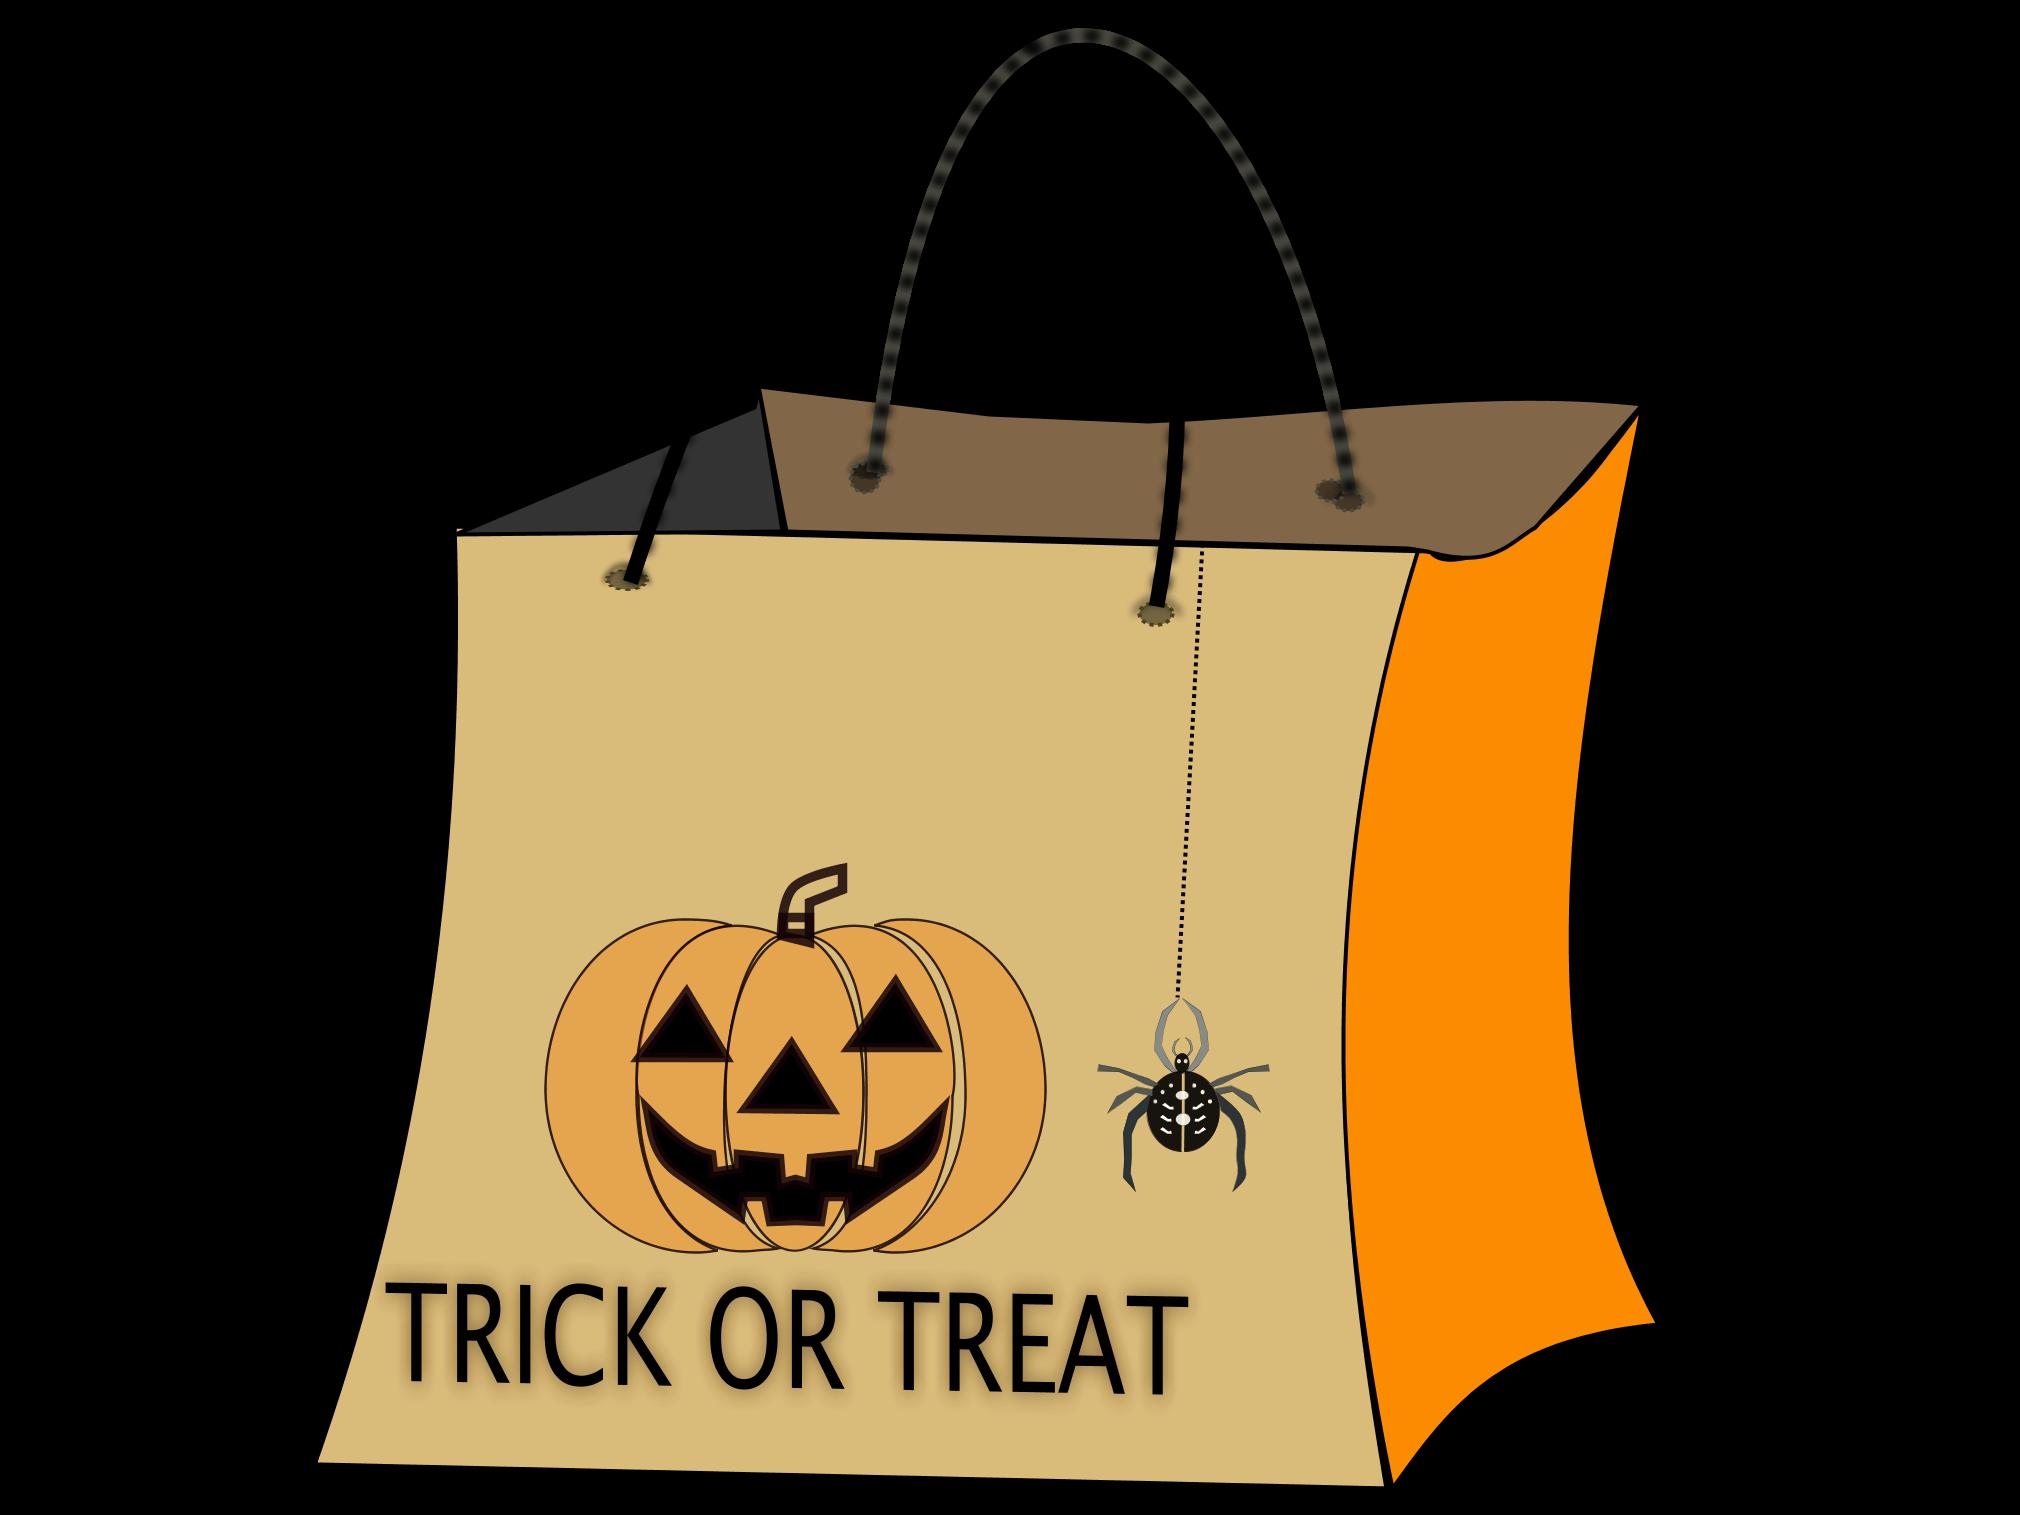 Halloween bag clipart image Halloween Bag Clip Art | Clipart Panda - Free Clipart Images image